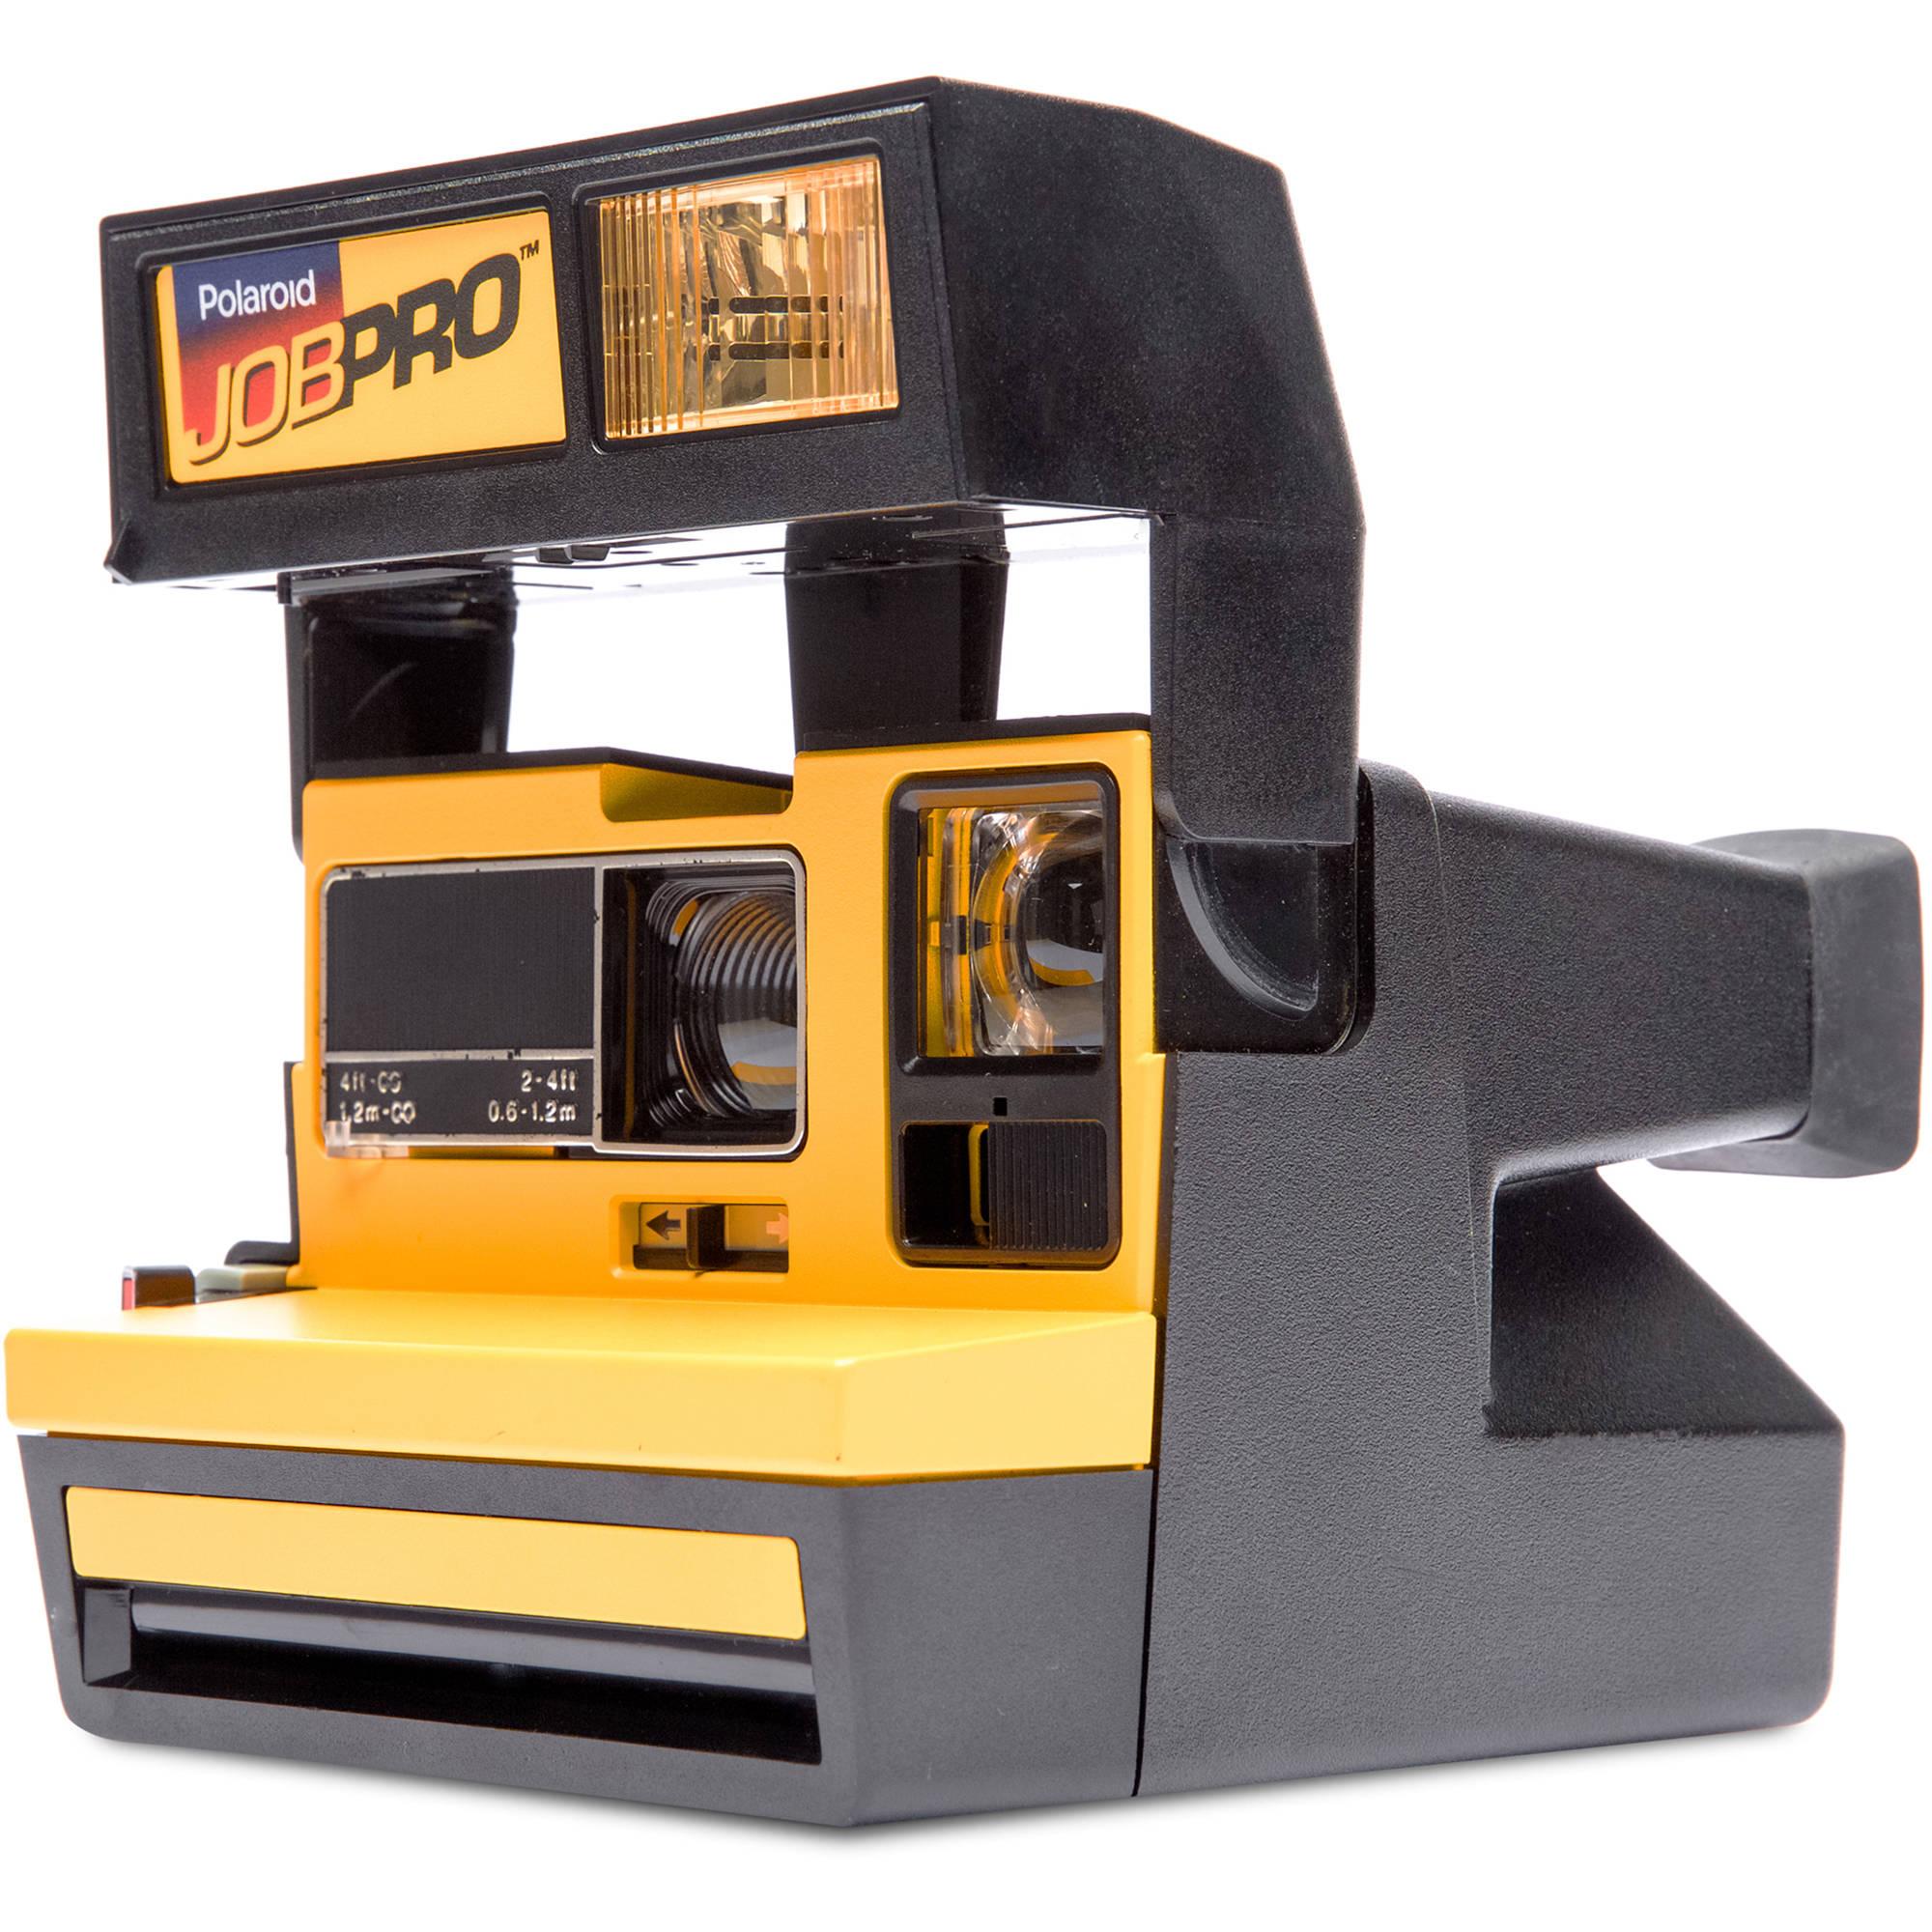 impossible polaroid 600 job pro instant film camera 1288 b h rh bhphotovideo com Polaroid OneStep SX-70 Batteries for Polaroid Job Pro 2